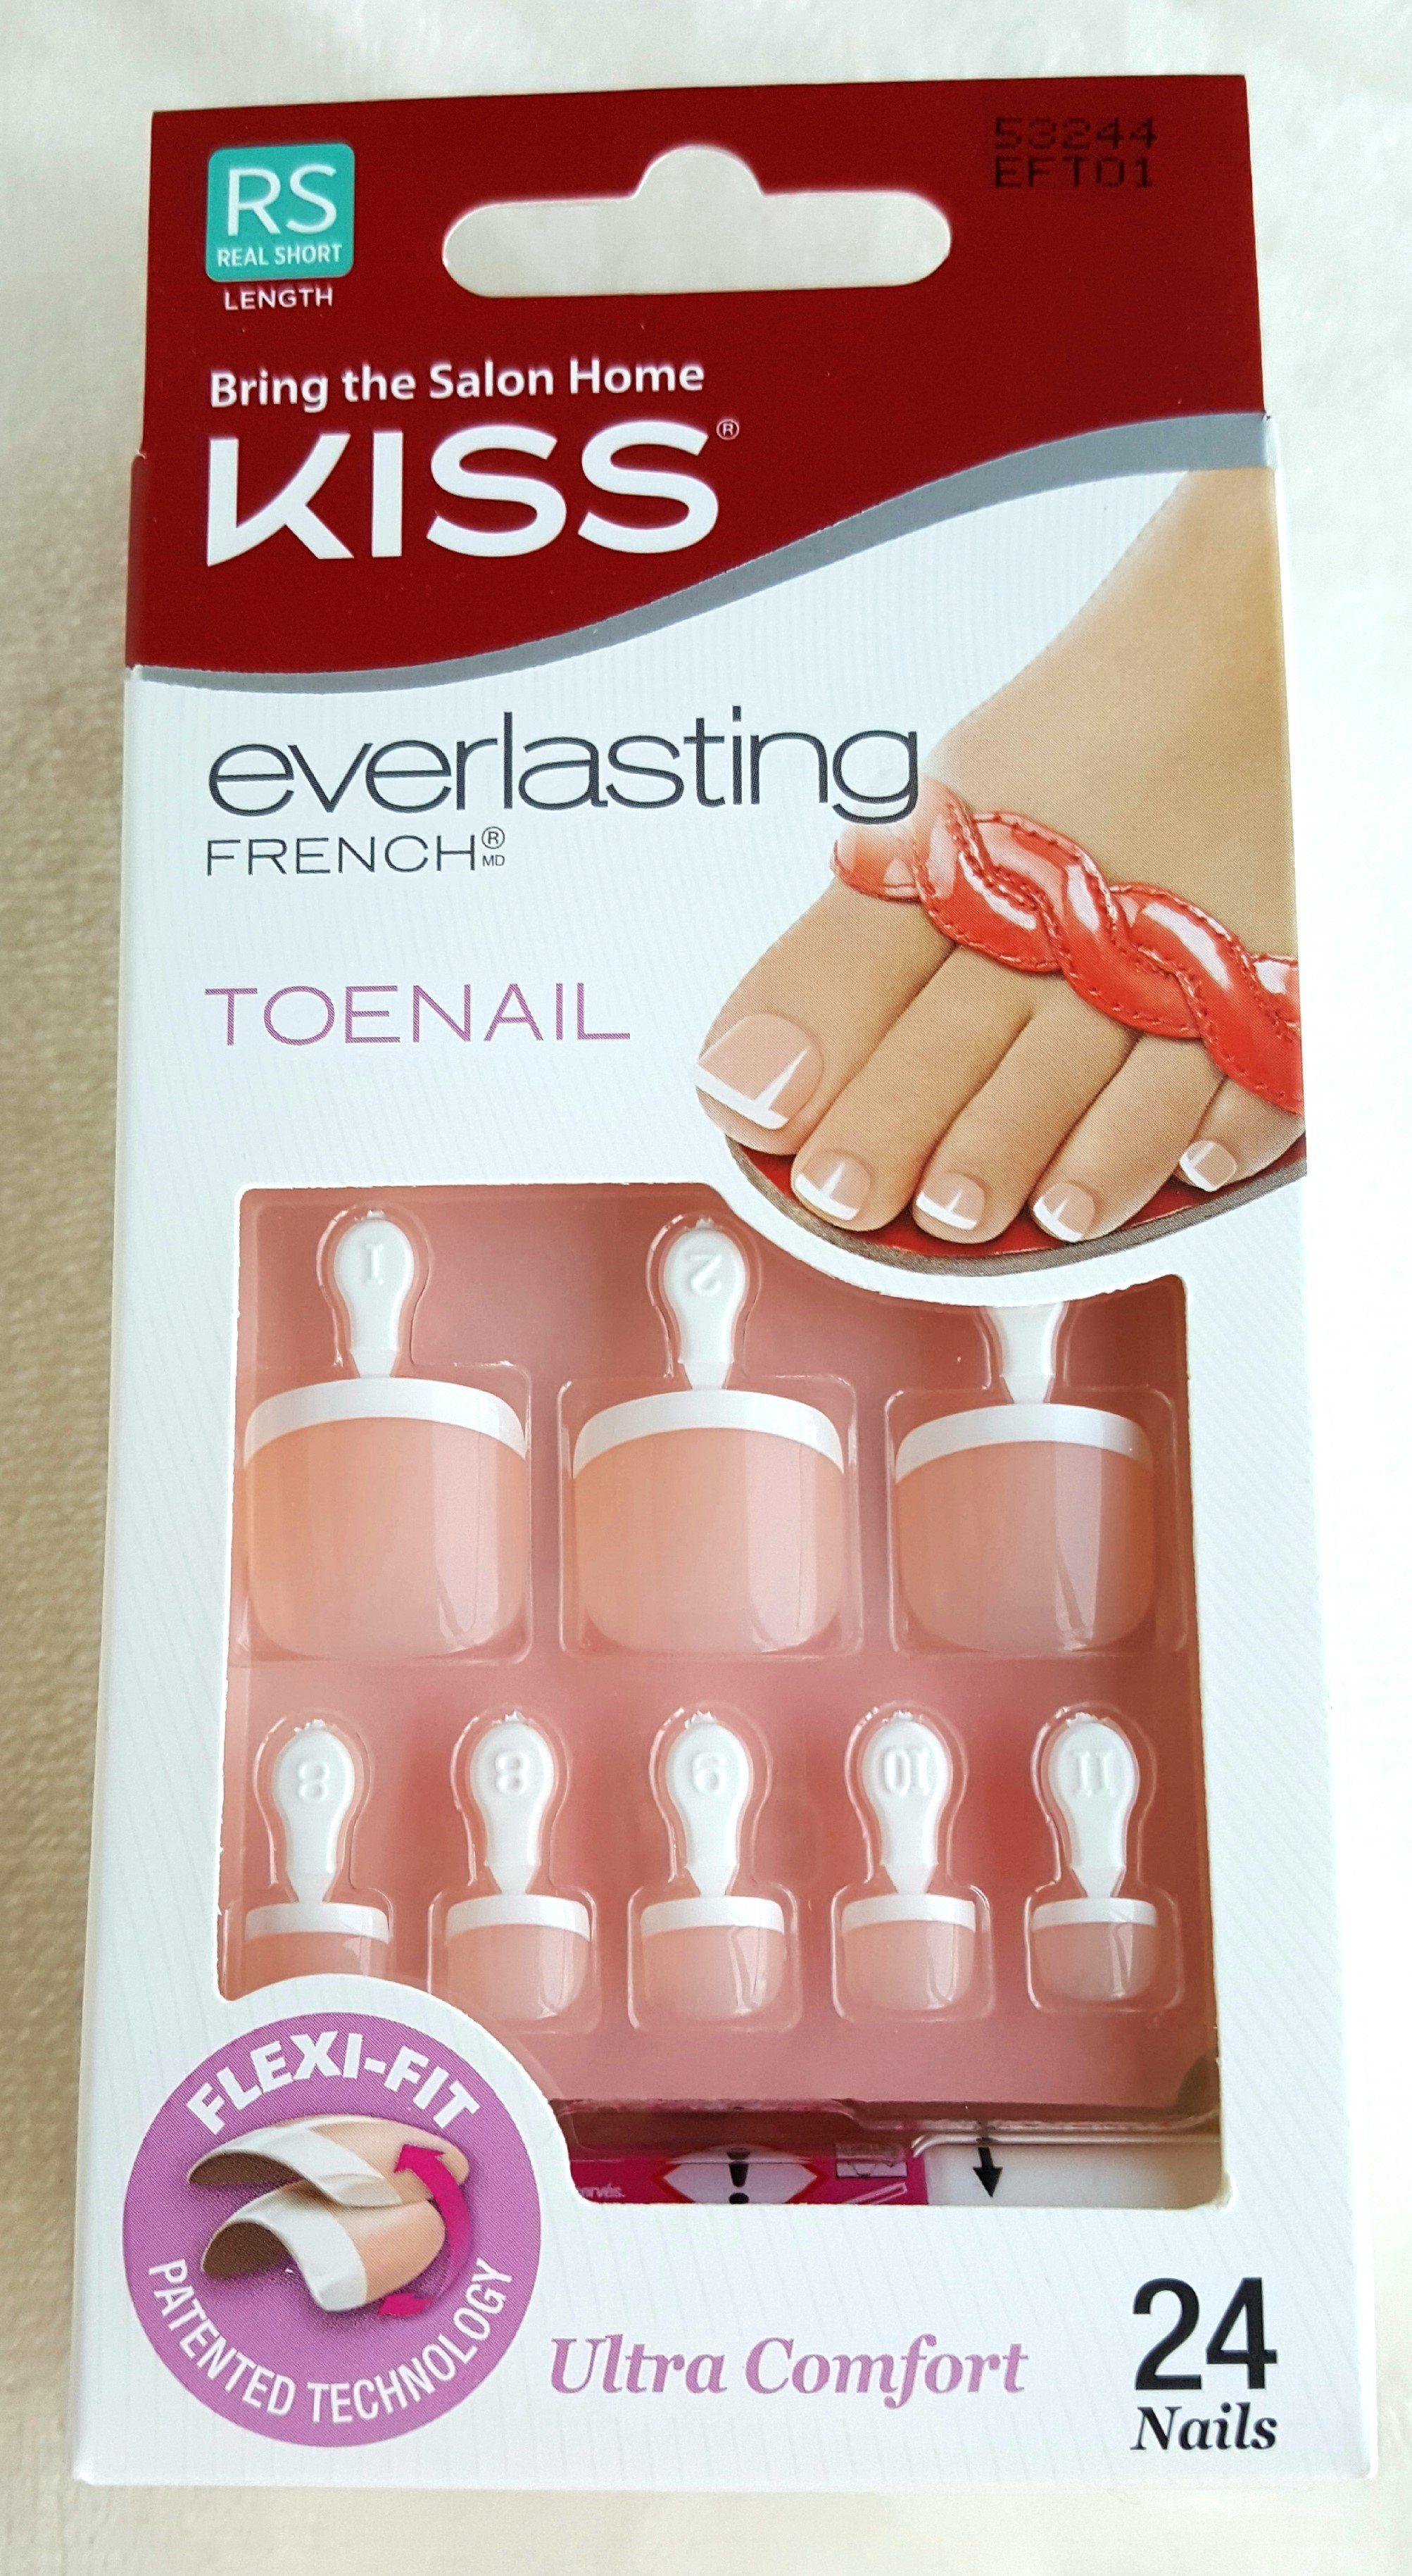 Kiss 24 Glue On Toenails Everlasting French Ultra Comfort White Tips 53244 Toe Nails Impress Nails Pretty Toe Nails